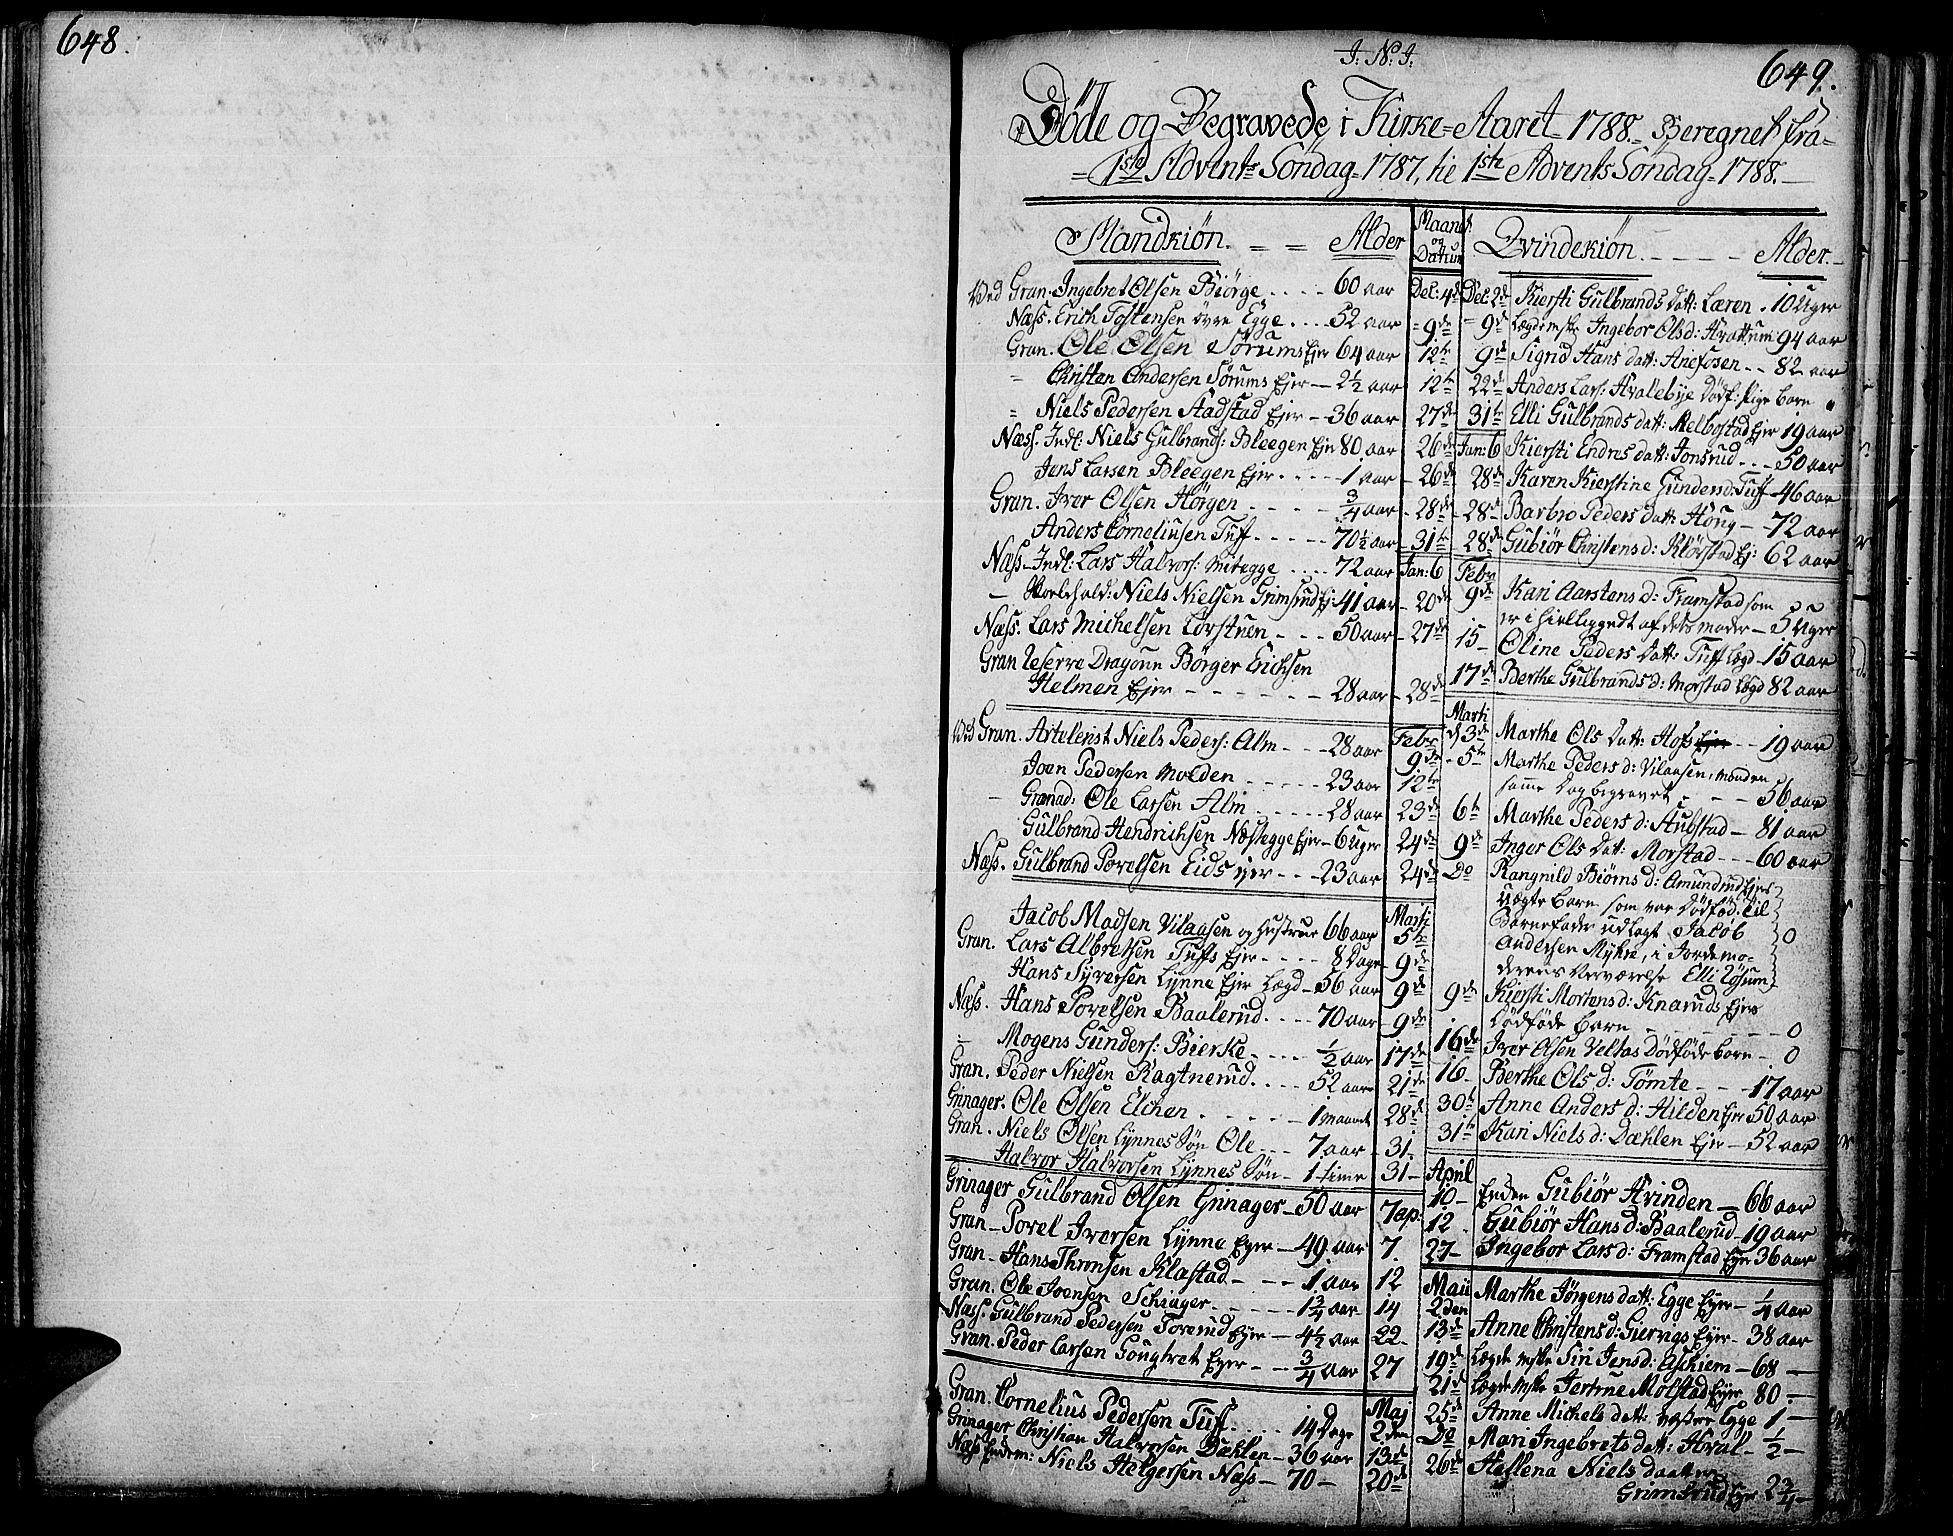 SAH, Gran prestekontor, Ministerialbok nr. 6, 1787-1824, s. 648-649